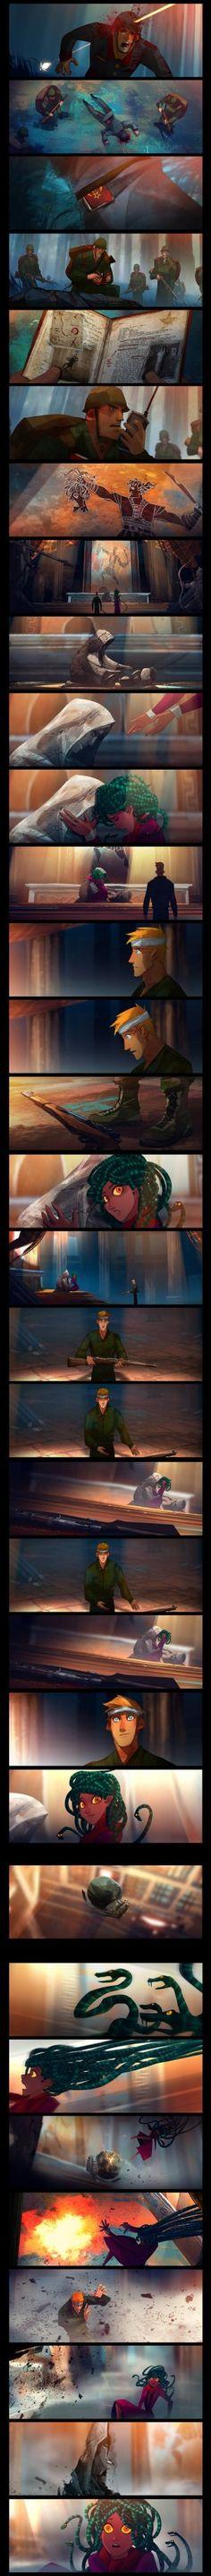 La historia de medusa parte 3